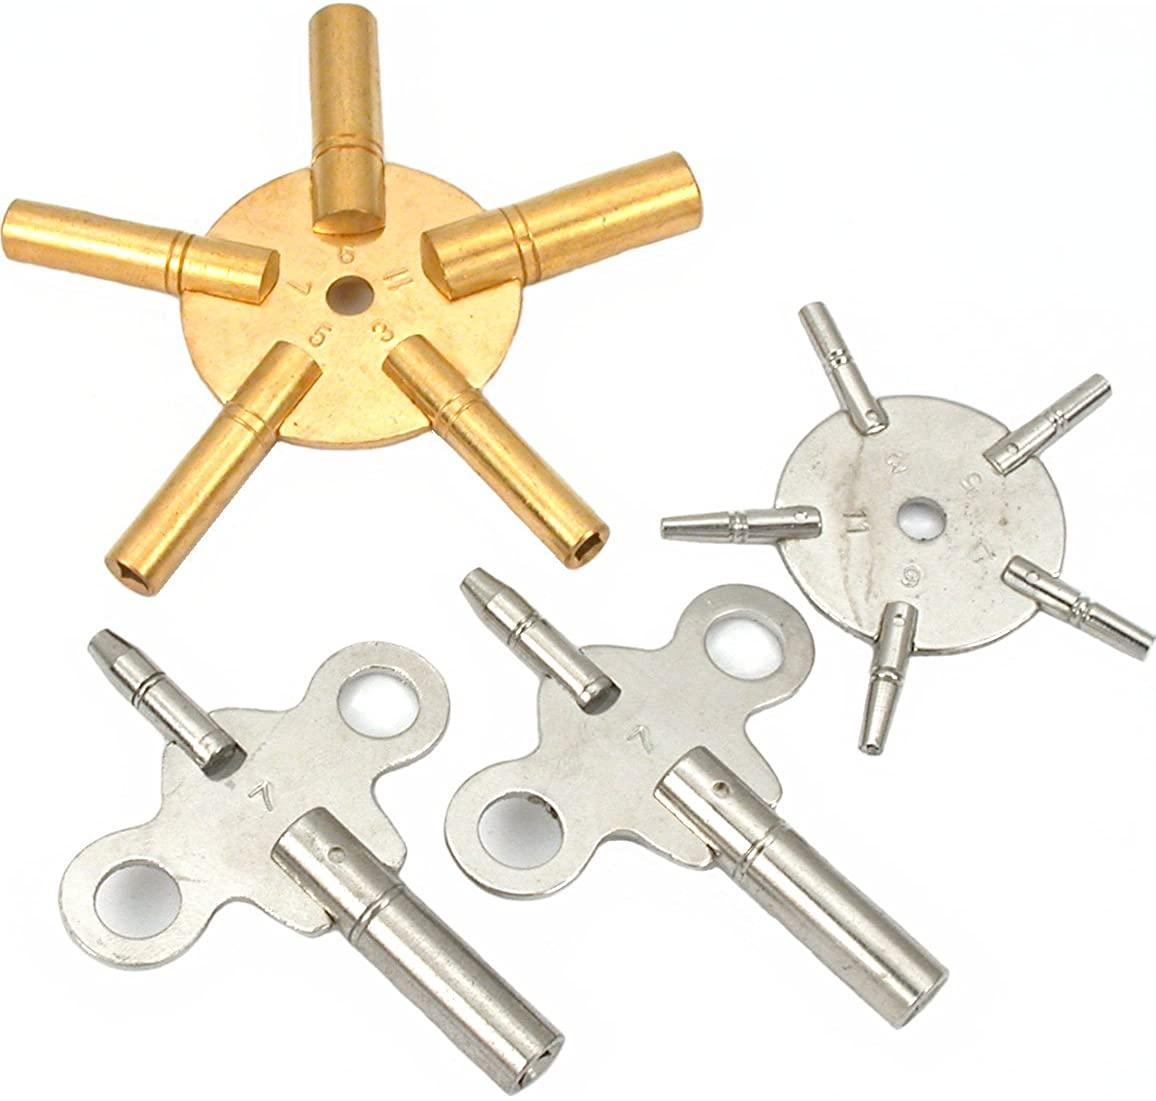 12 Clock Keys Two 5 Pronged Winding Tools Sz 3,5,7,9,11